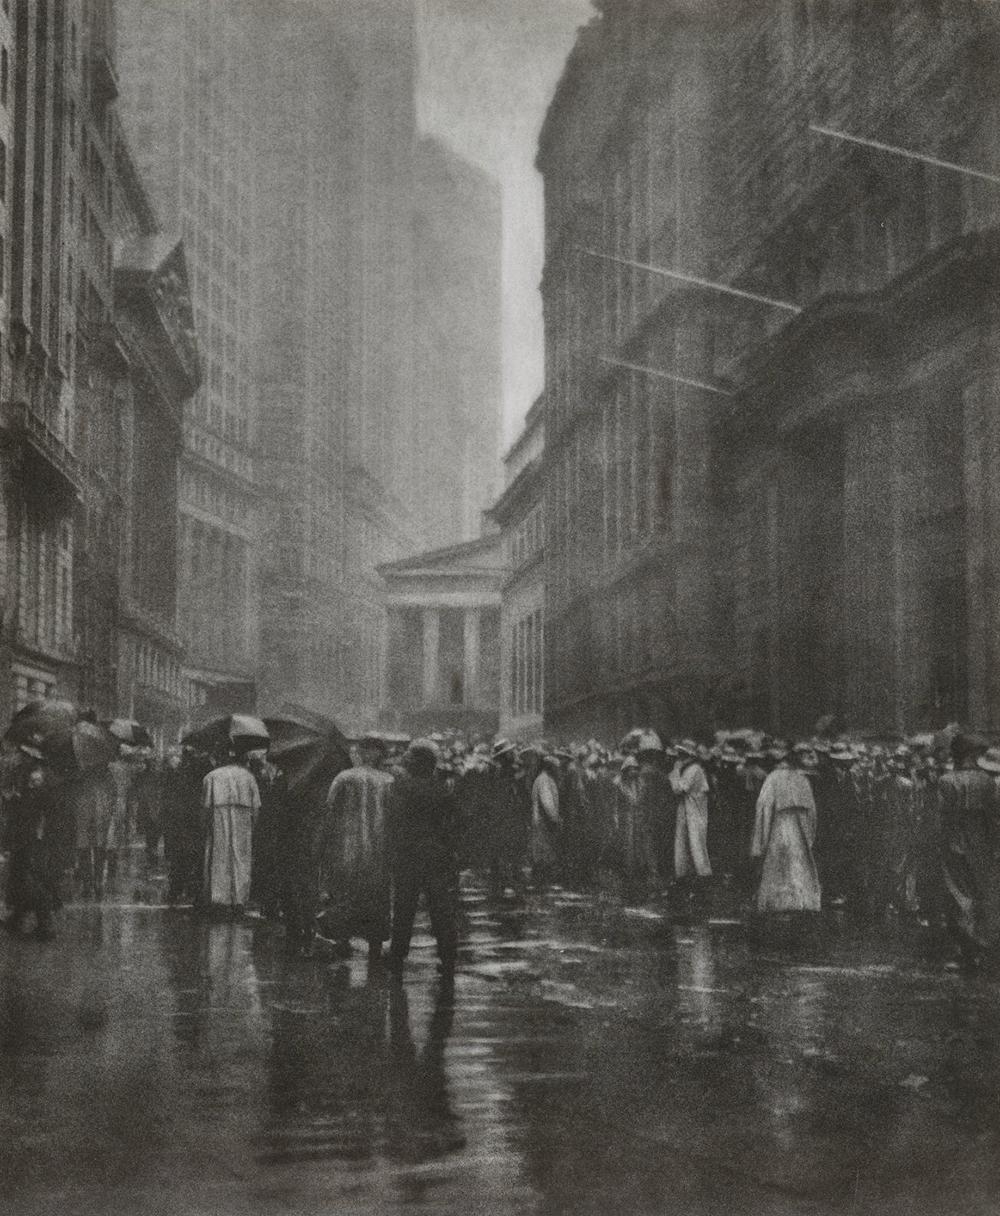 The Curb Market, New York, by Joseph Petrocelli, 1921. Brooklyn Museum, Gift of Mrs. Joseph Petrocelli.